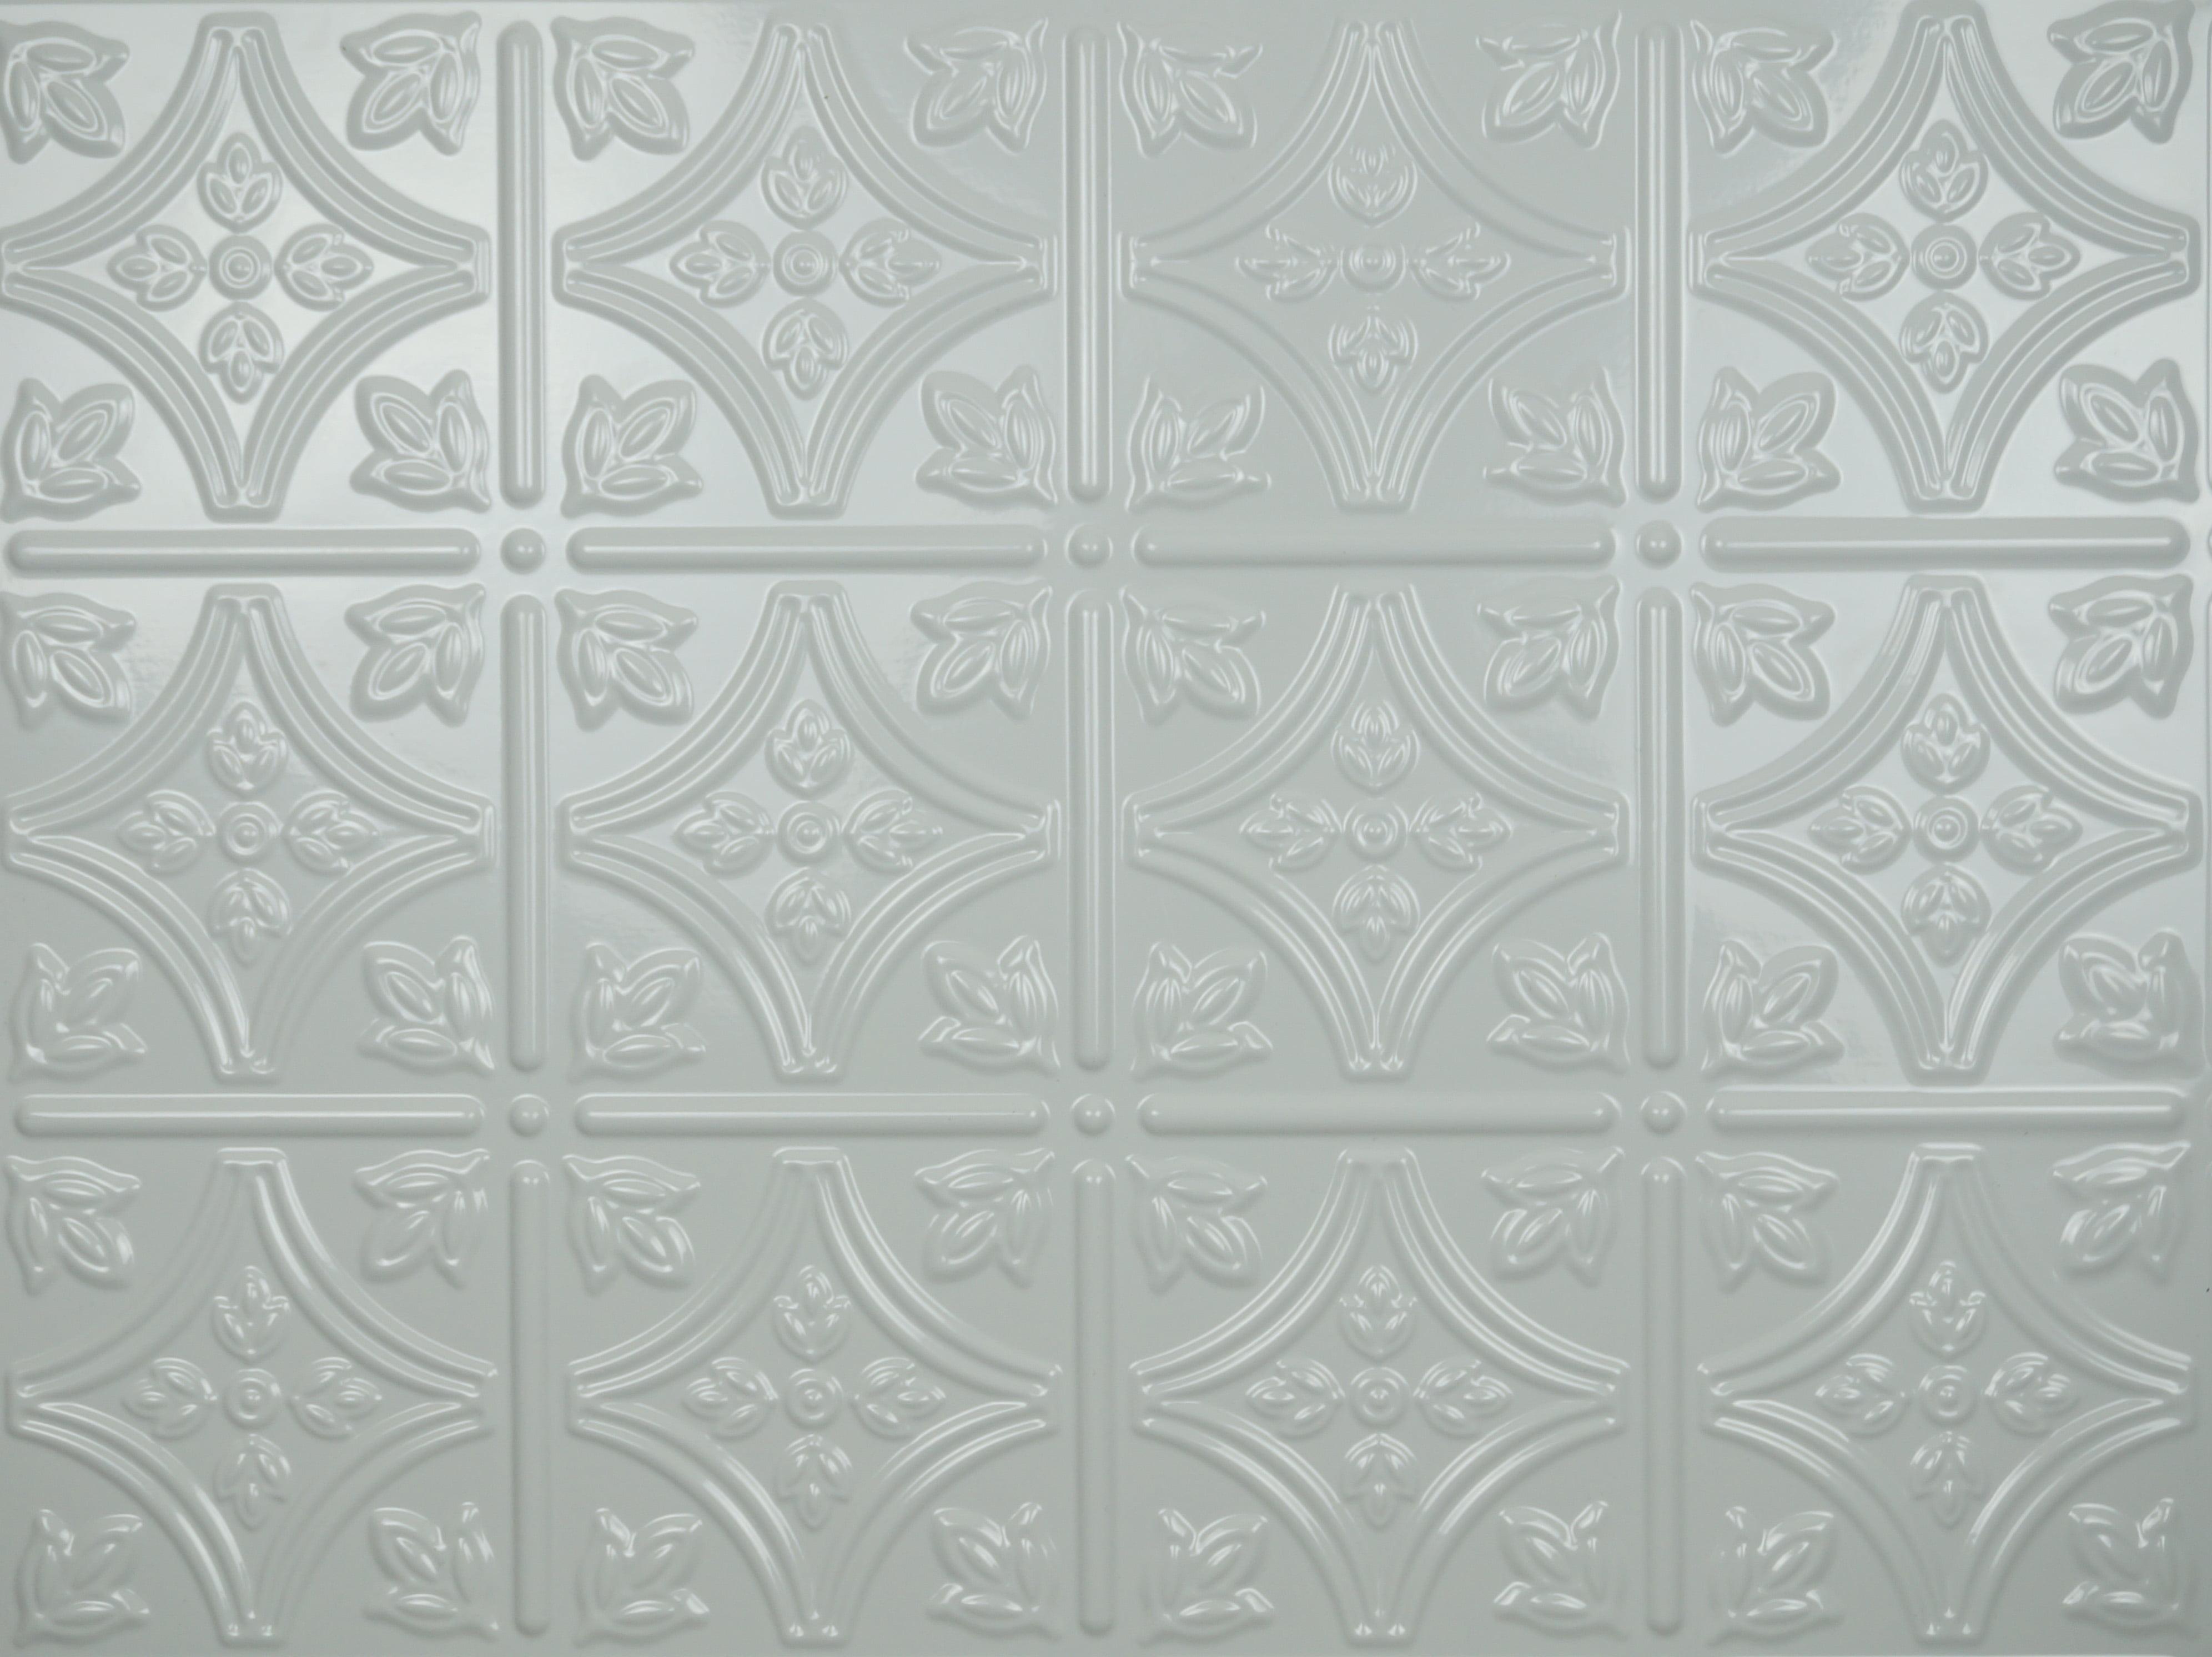 Empire Thermoplastic Backsplash Tiles Kitchen Bathroom Shower